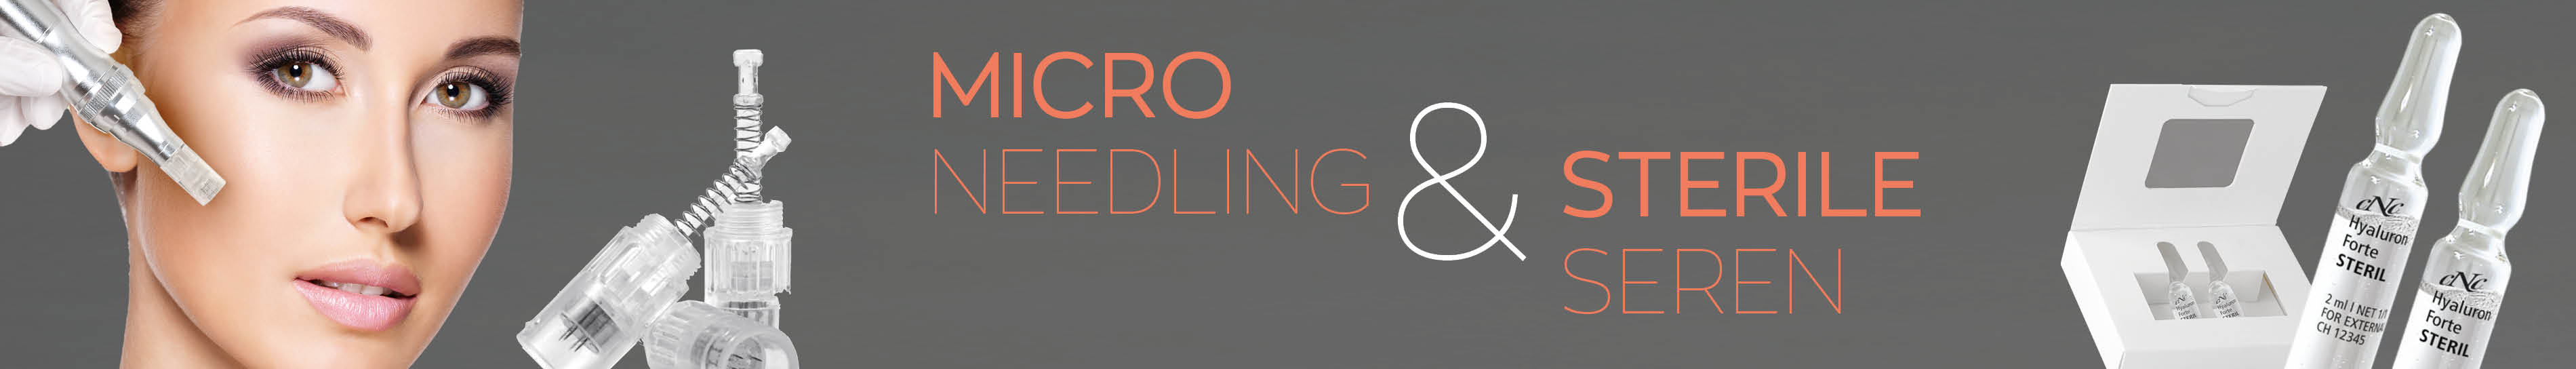 Angebot_MicroNeedling_3800x544